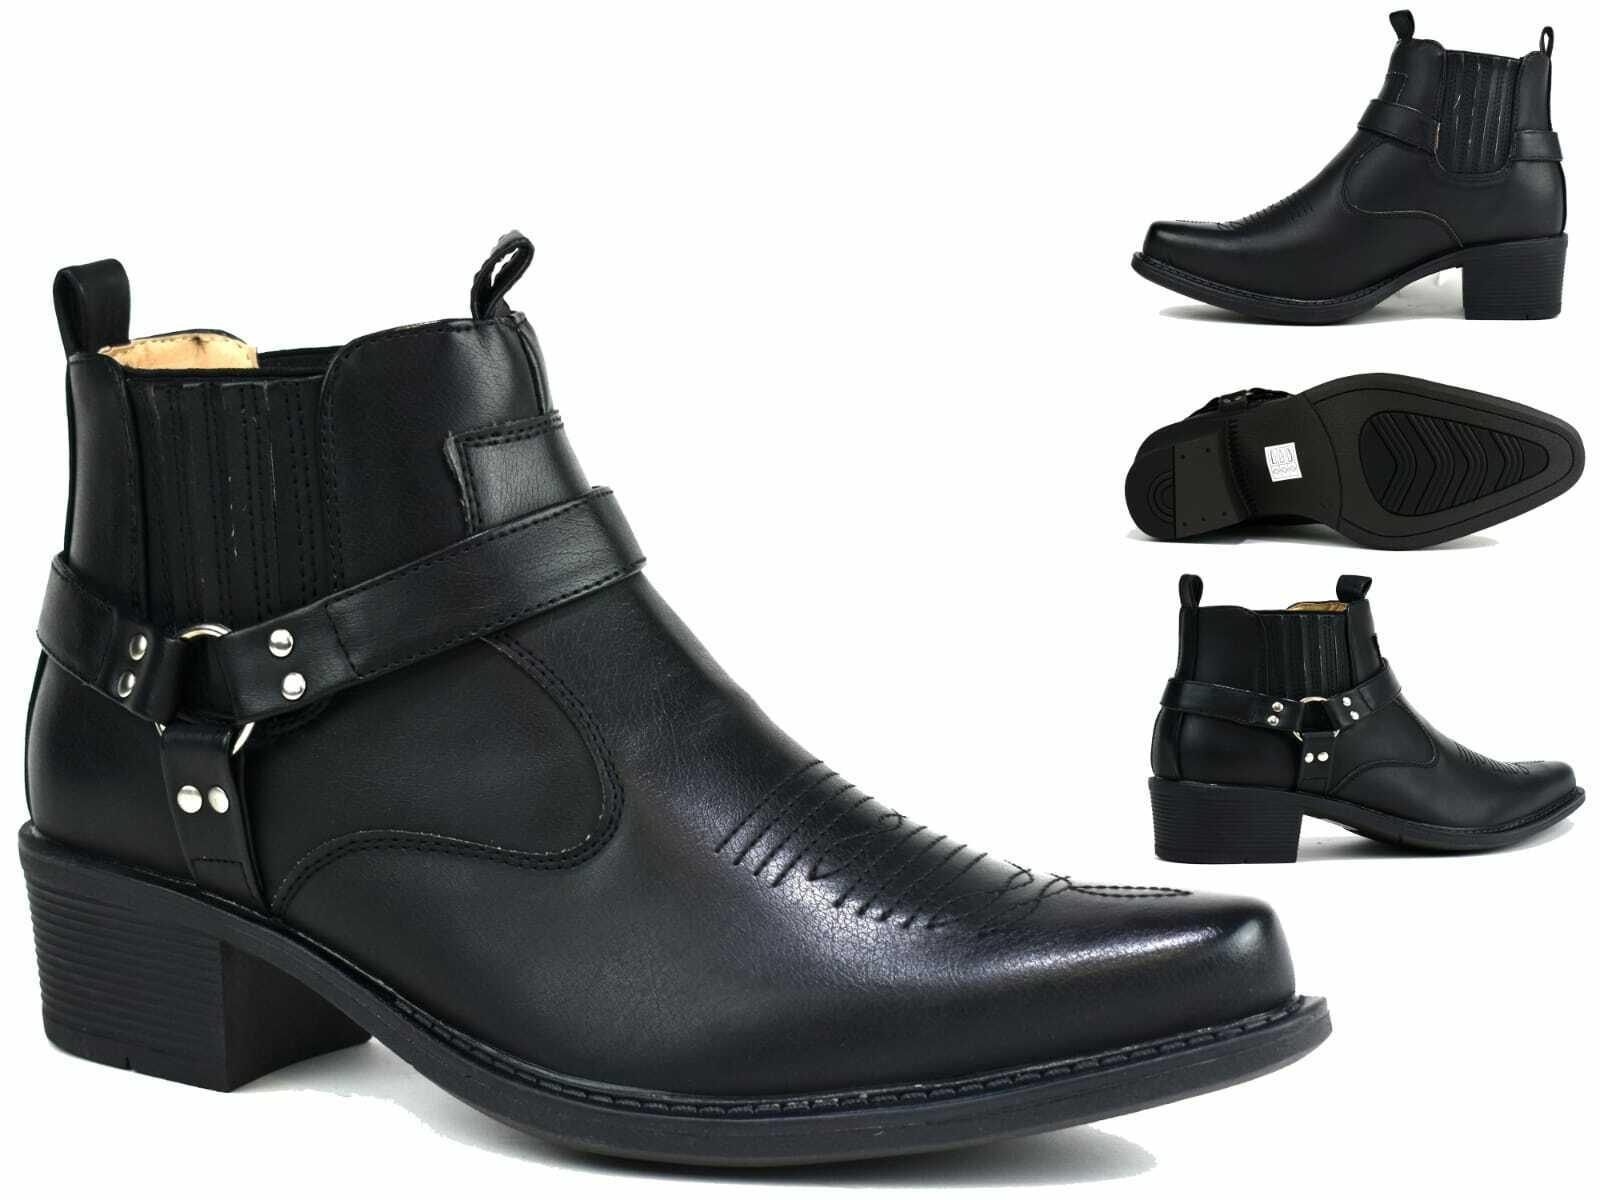 Men/Gents Smart Buckle Chain Cowboys Cuban Heel New Boots UK Size 6-11